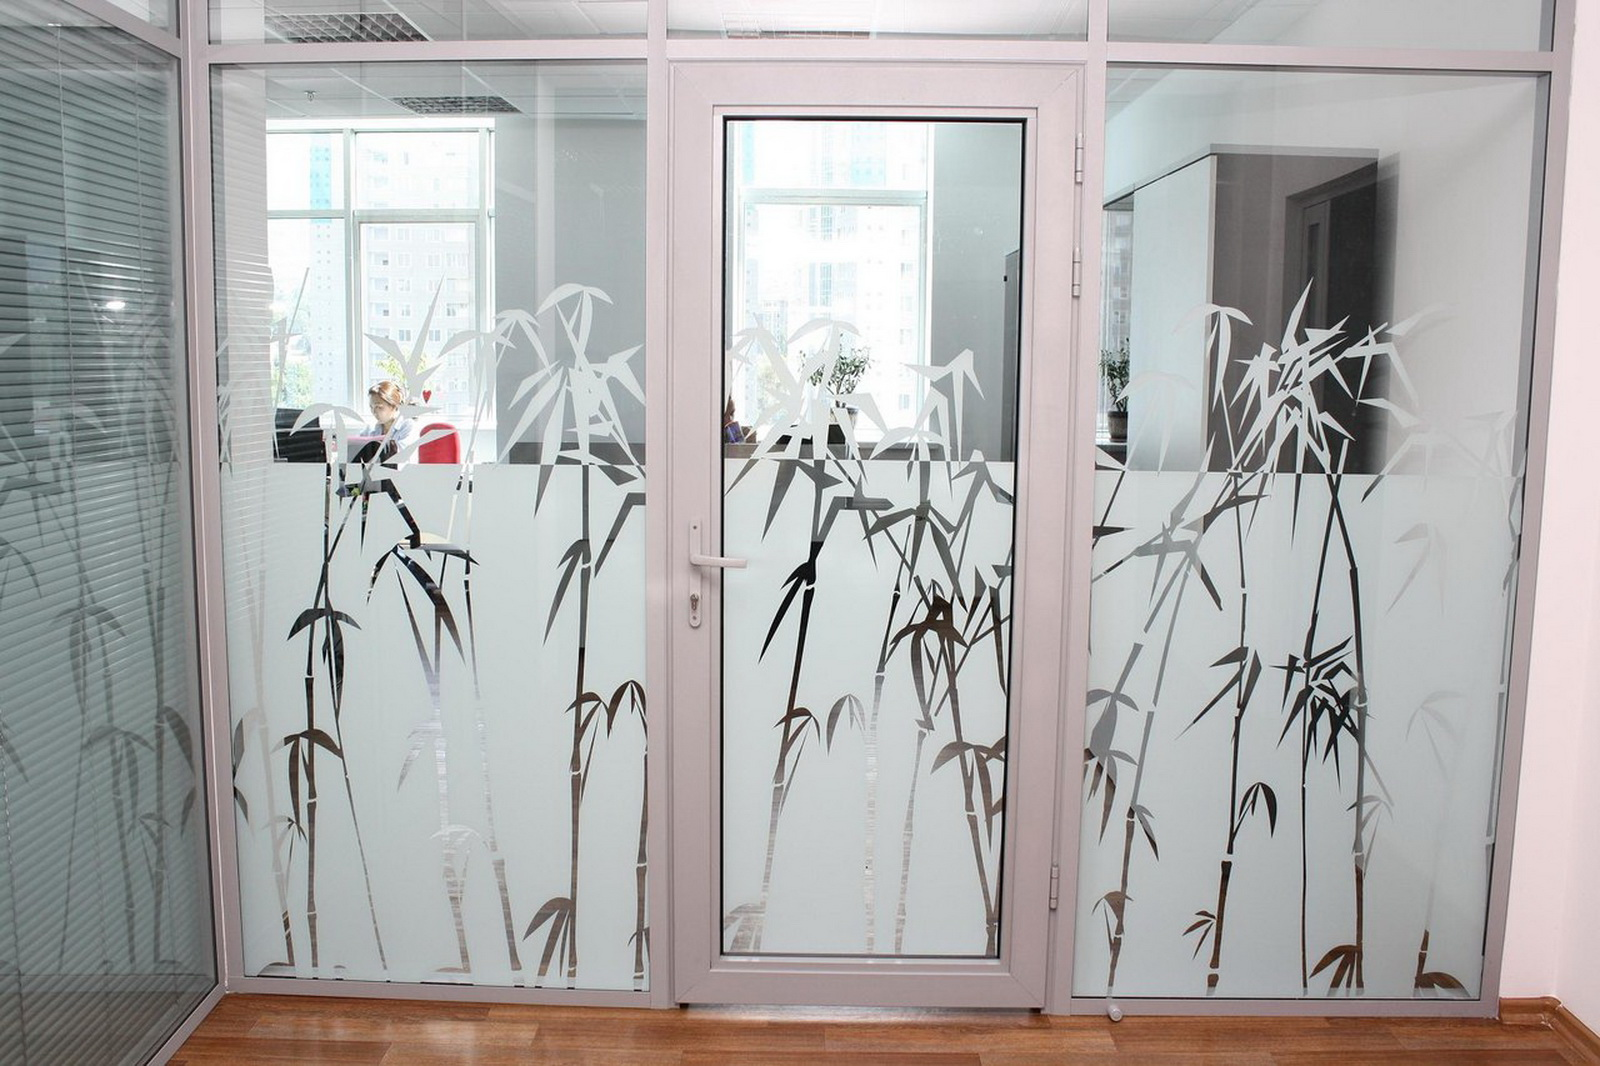 Декоративная пленка на стекло в Чебоксарах по низким ценам м.